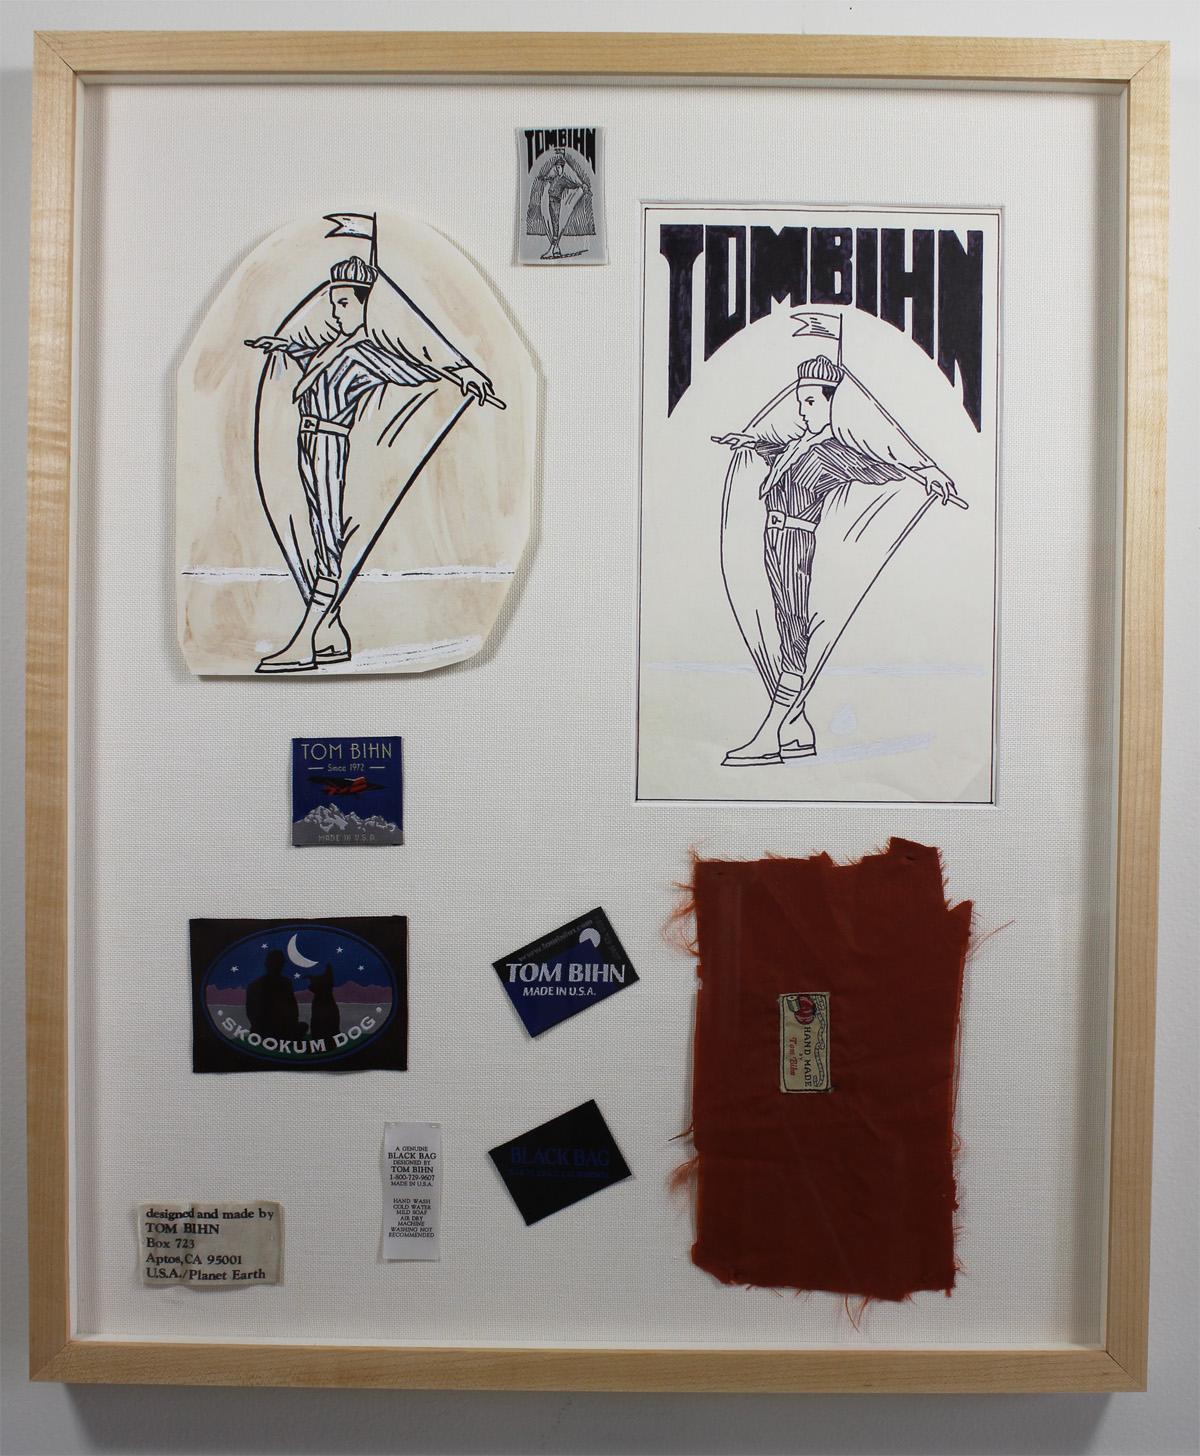 Tom Bihn Labels.jpg